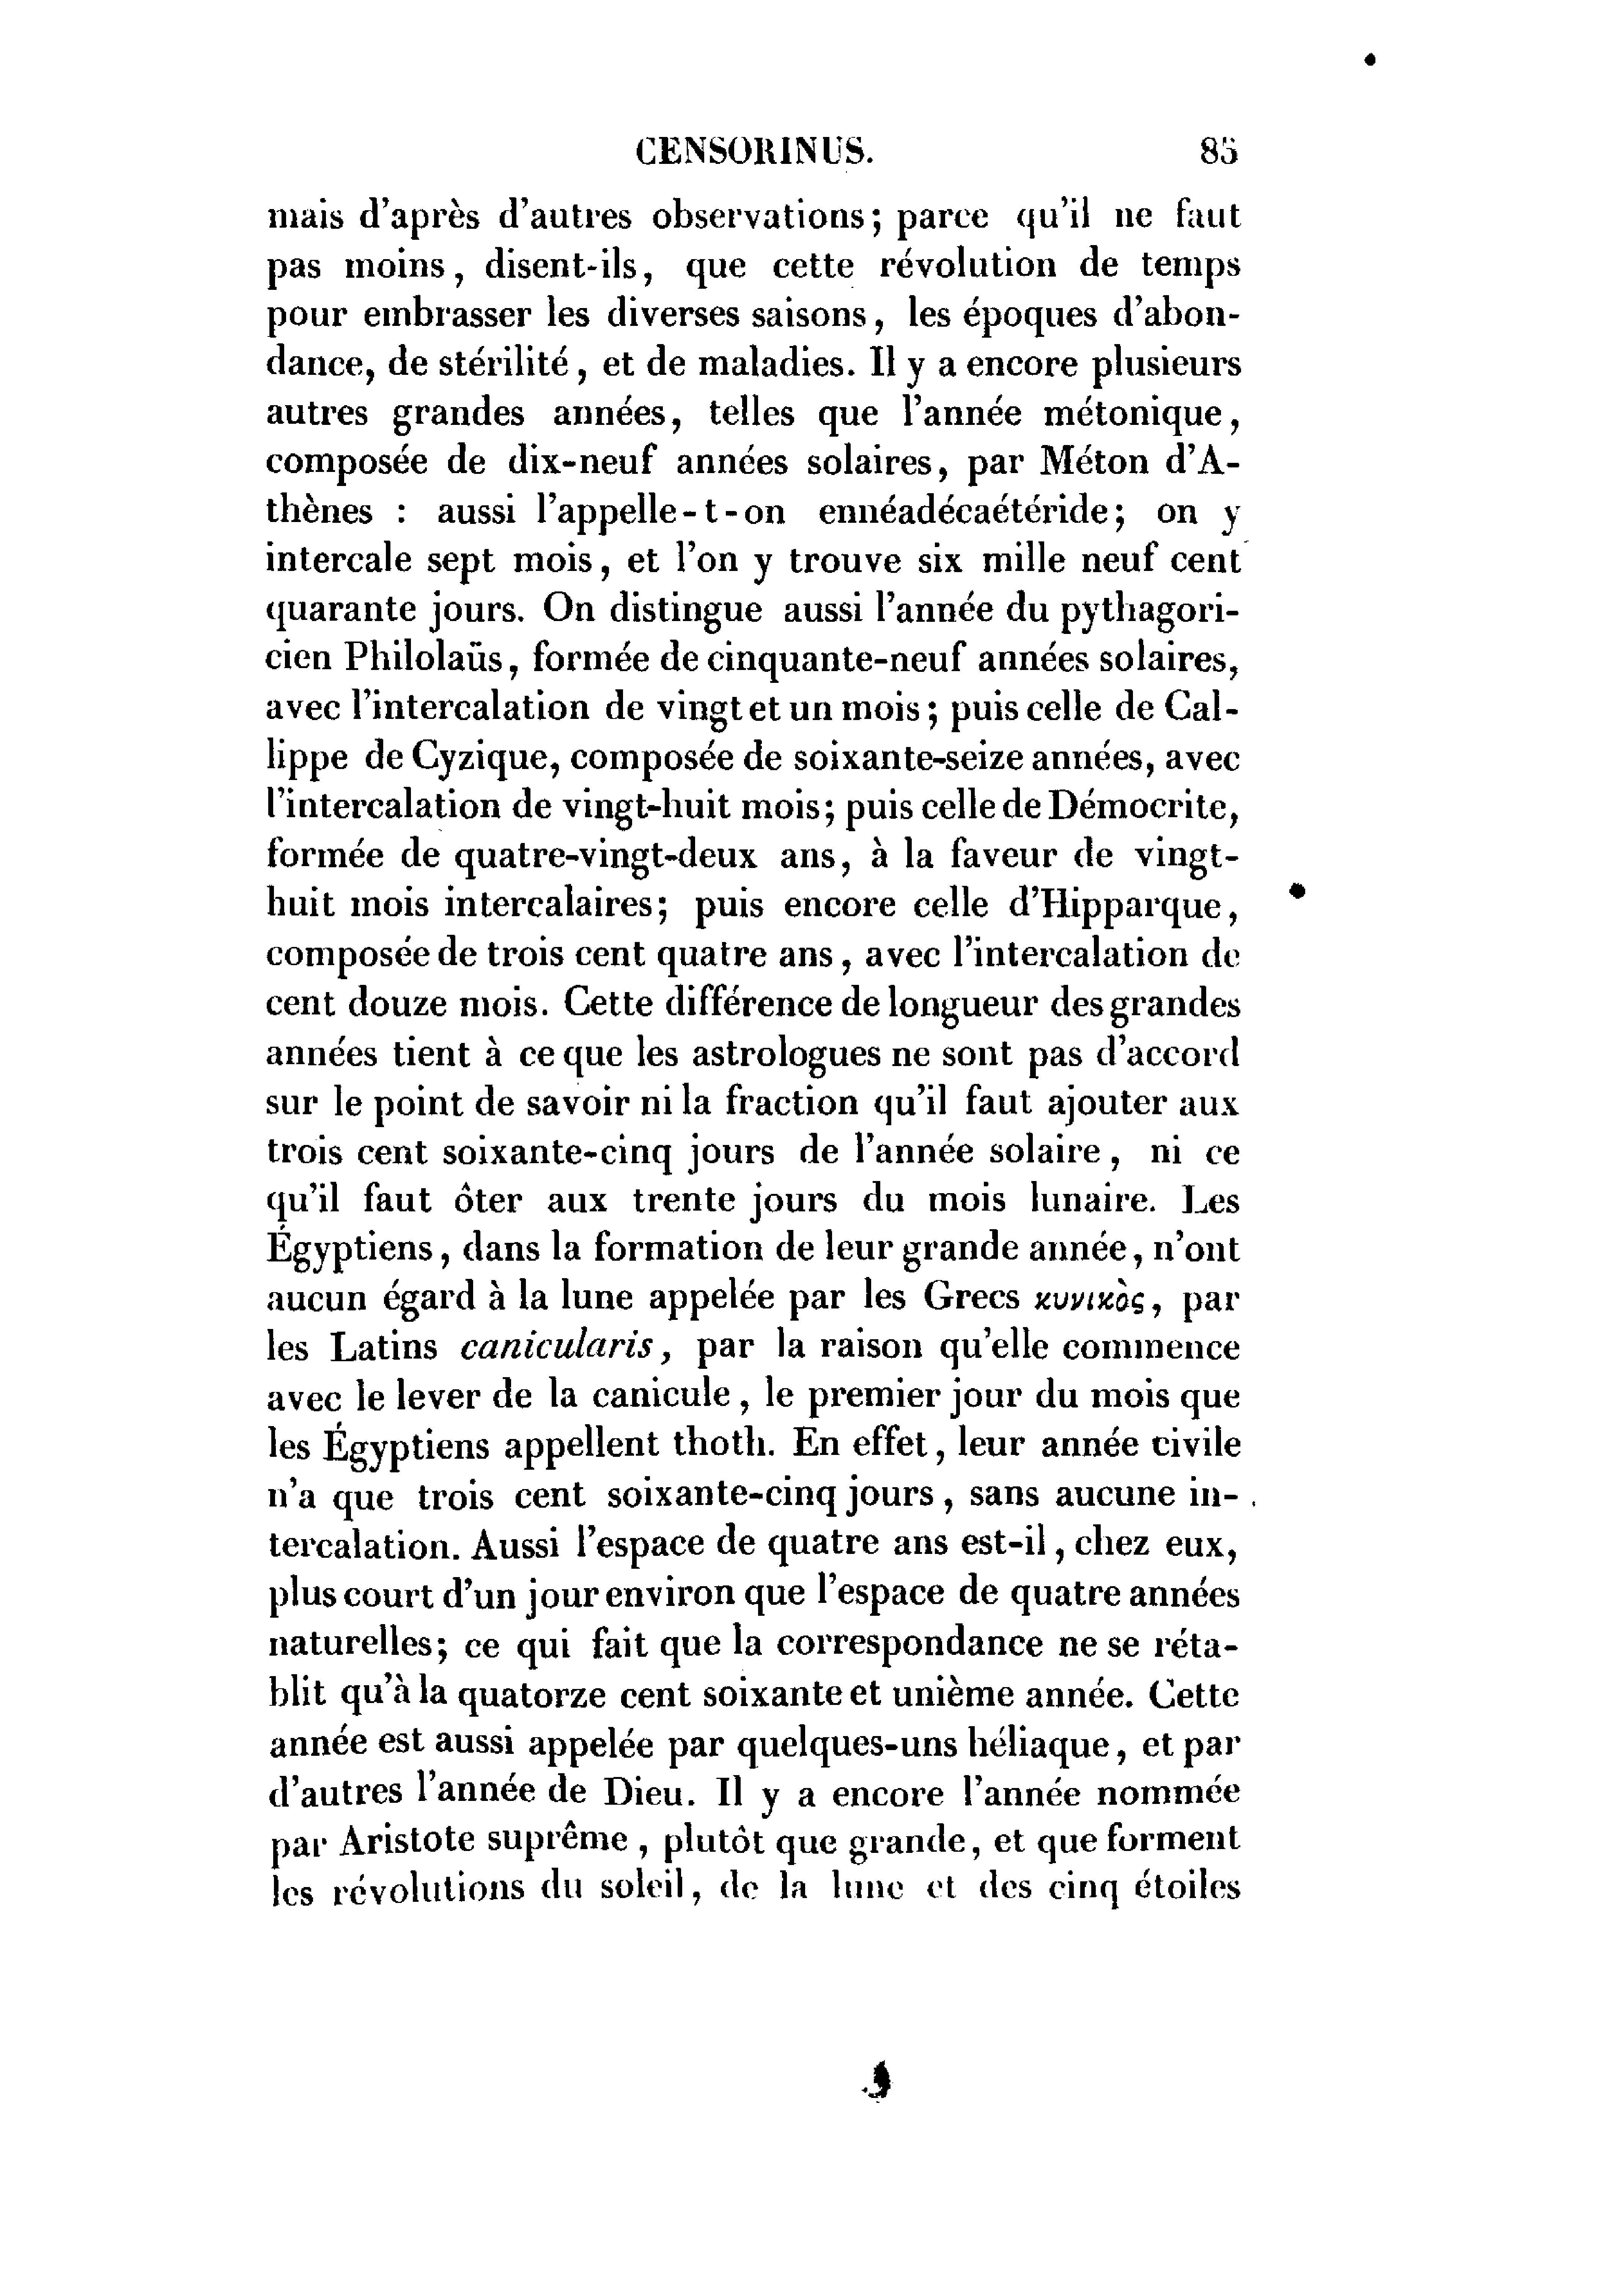 Downfall of roman empire essay